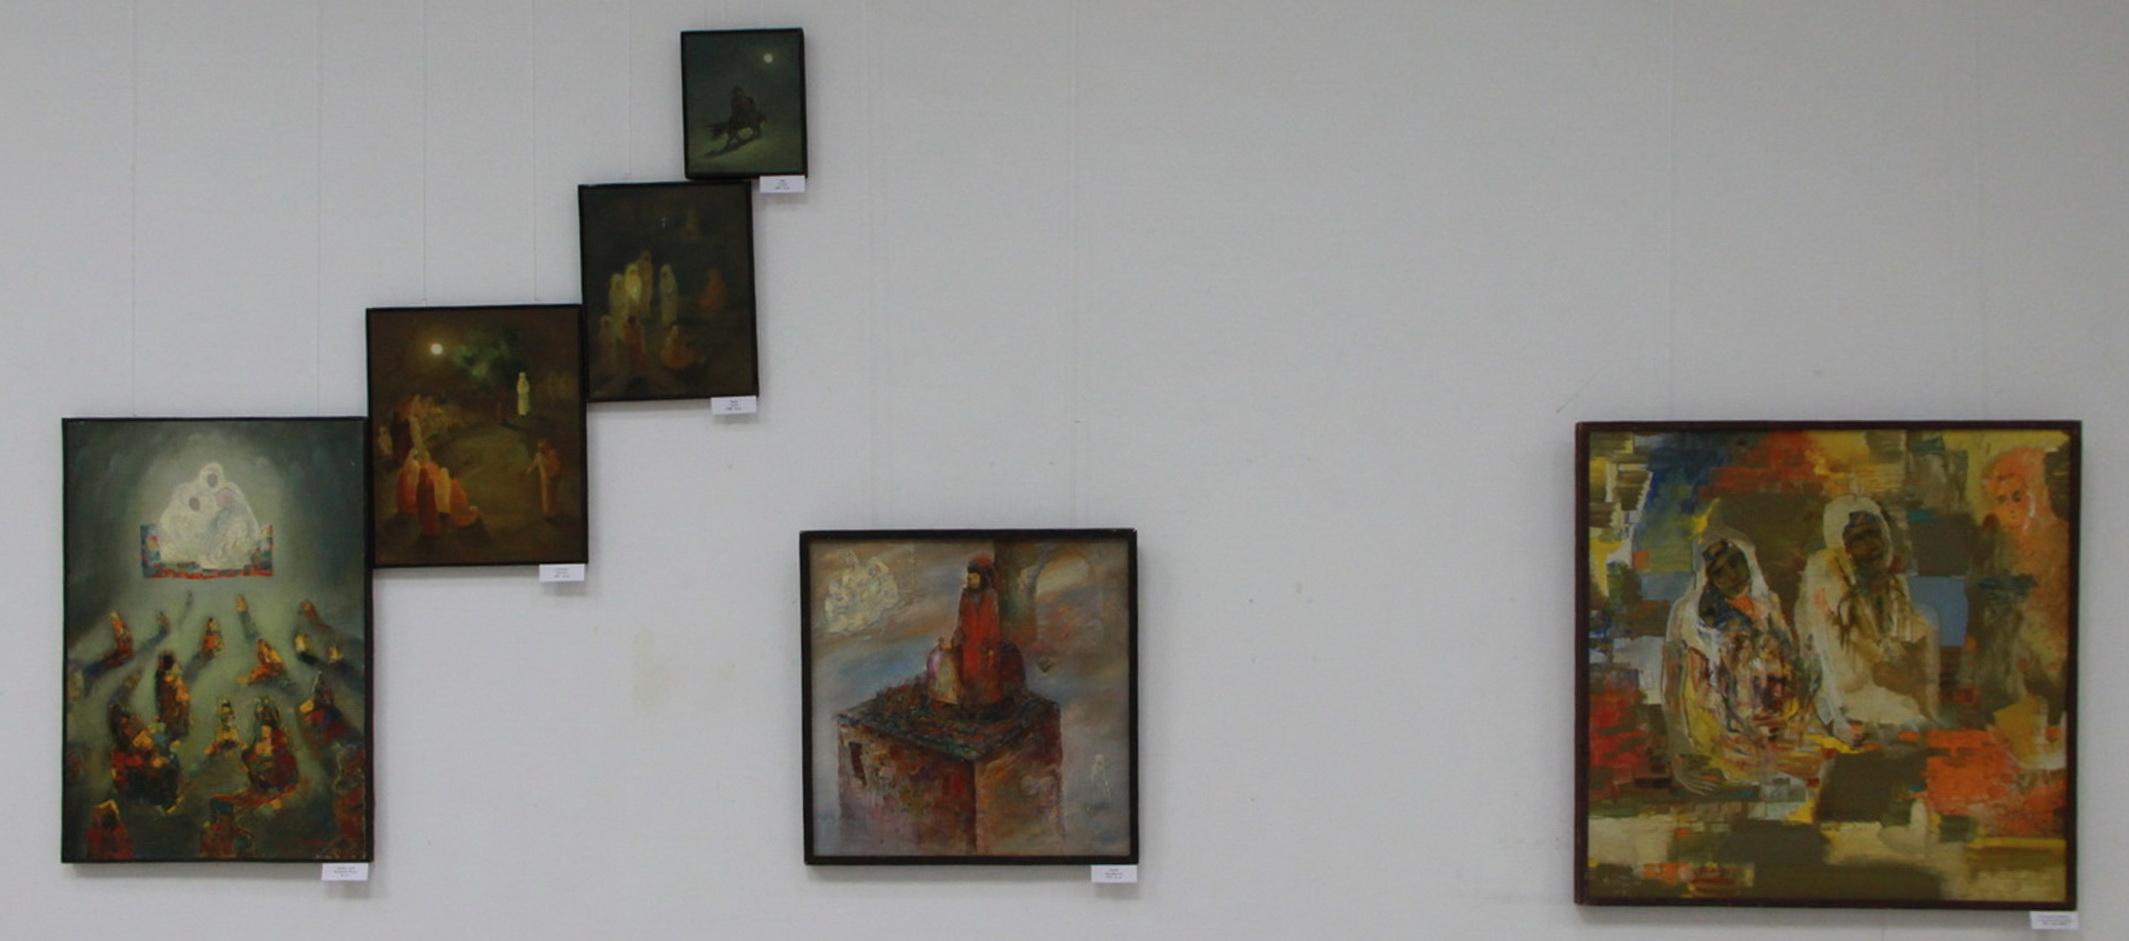 Аслиддин Исаев. Экспозиция картин. 2019 ЦВЗ